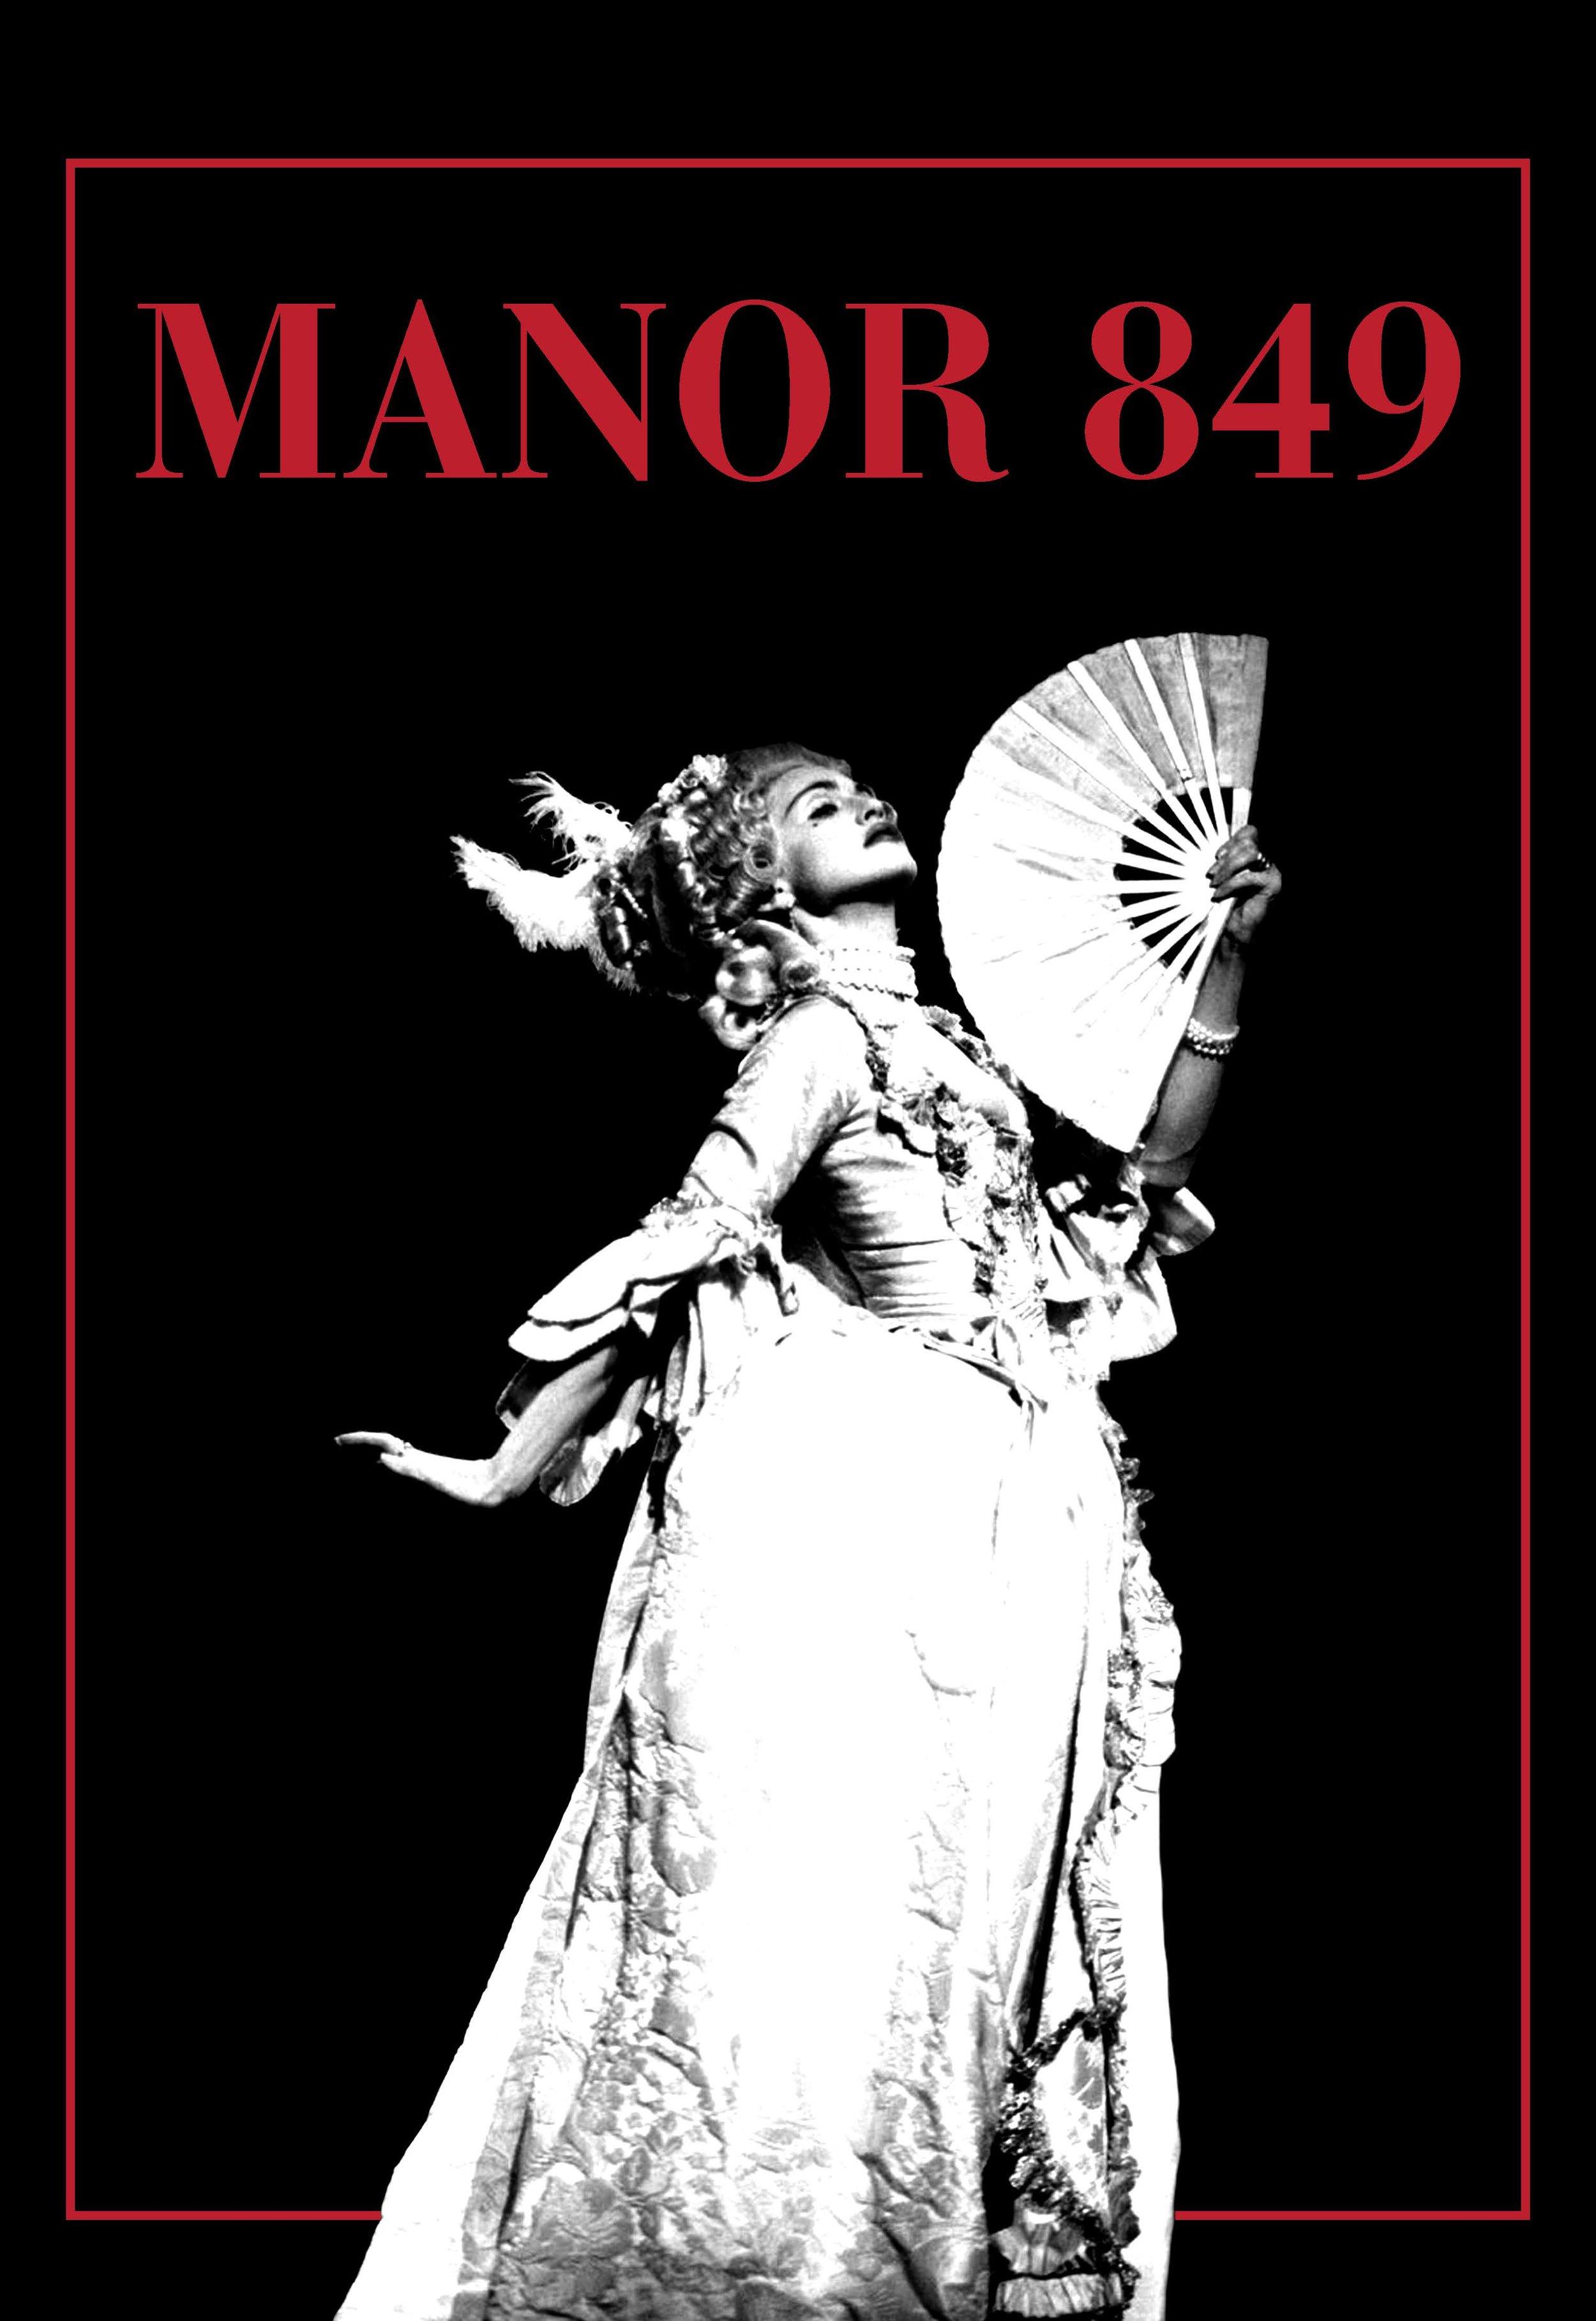 Manor_849_Madonna.jpg